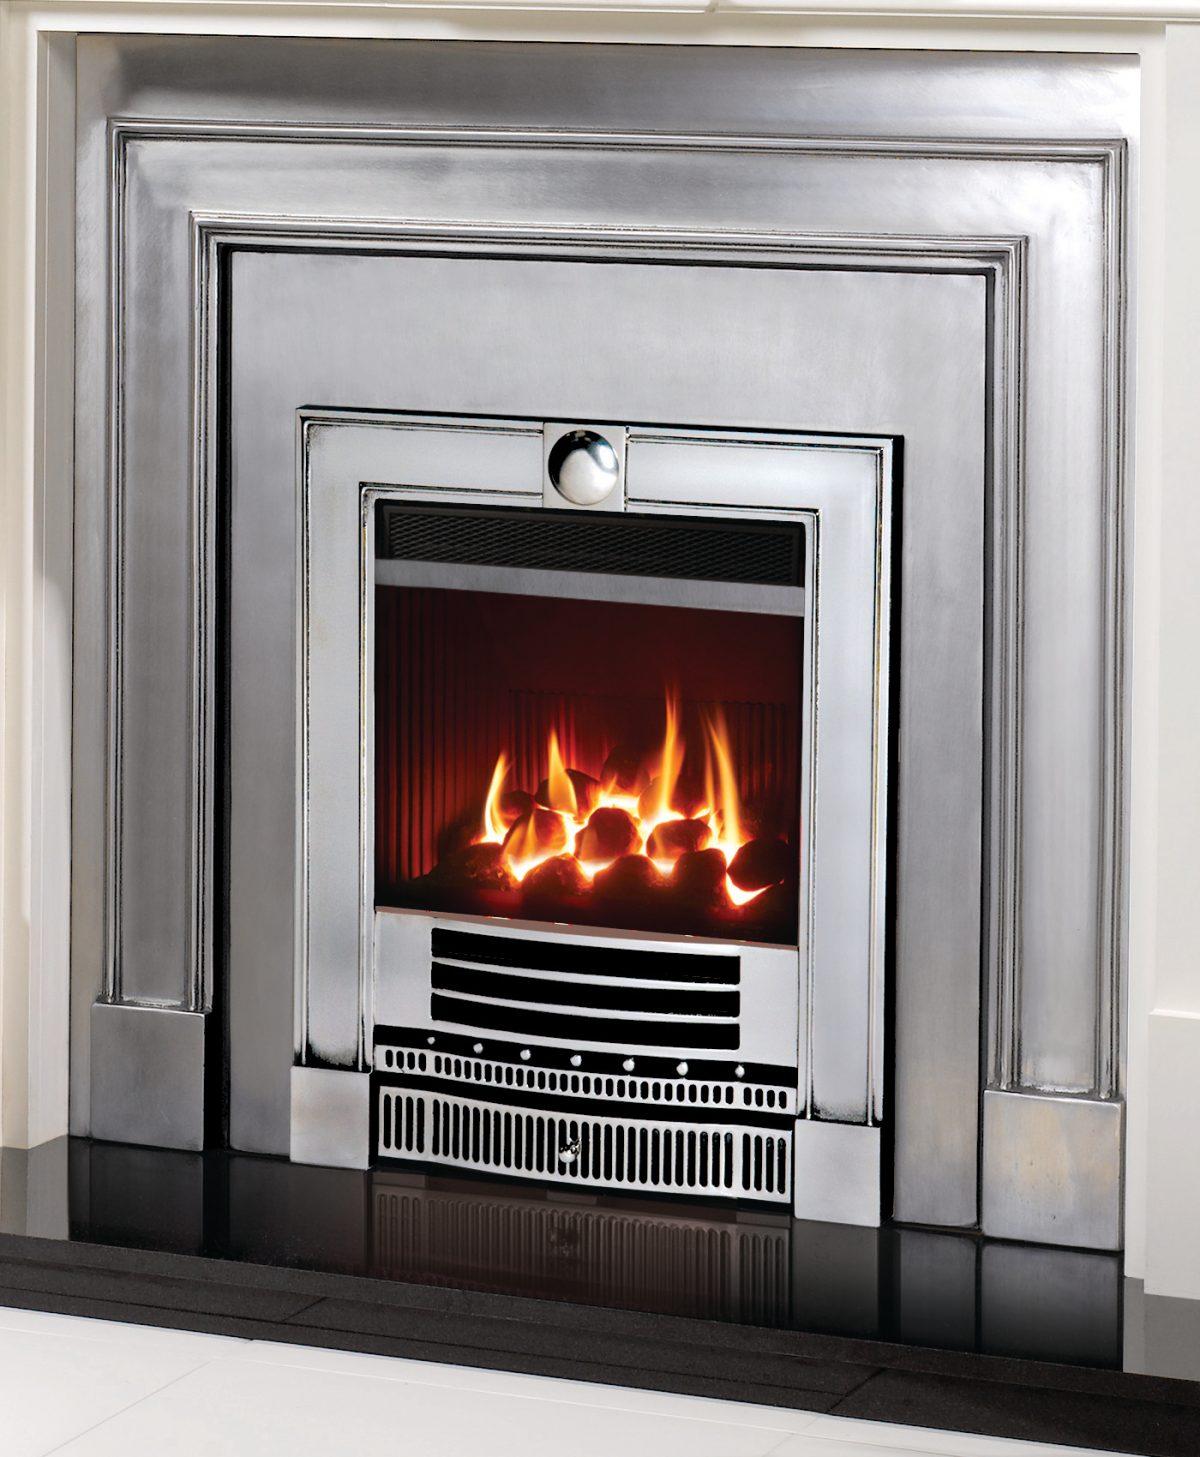 Gazco Logic HE Inset Gas fire with log effect, Balanced Flue, LPG Gas - Remote control